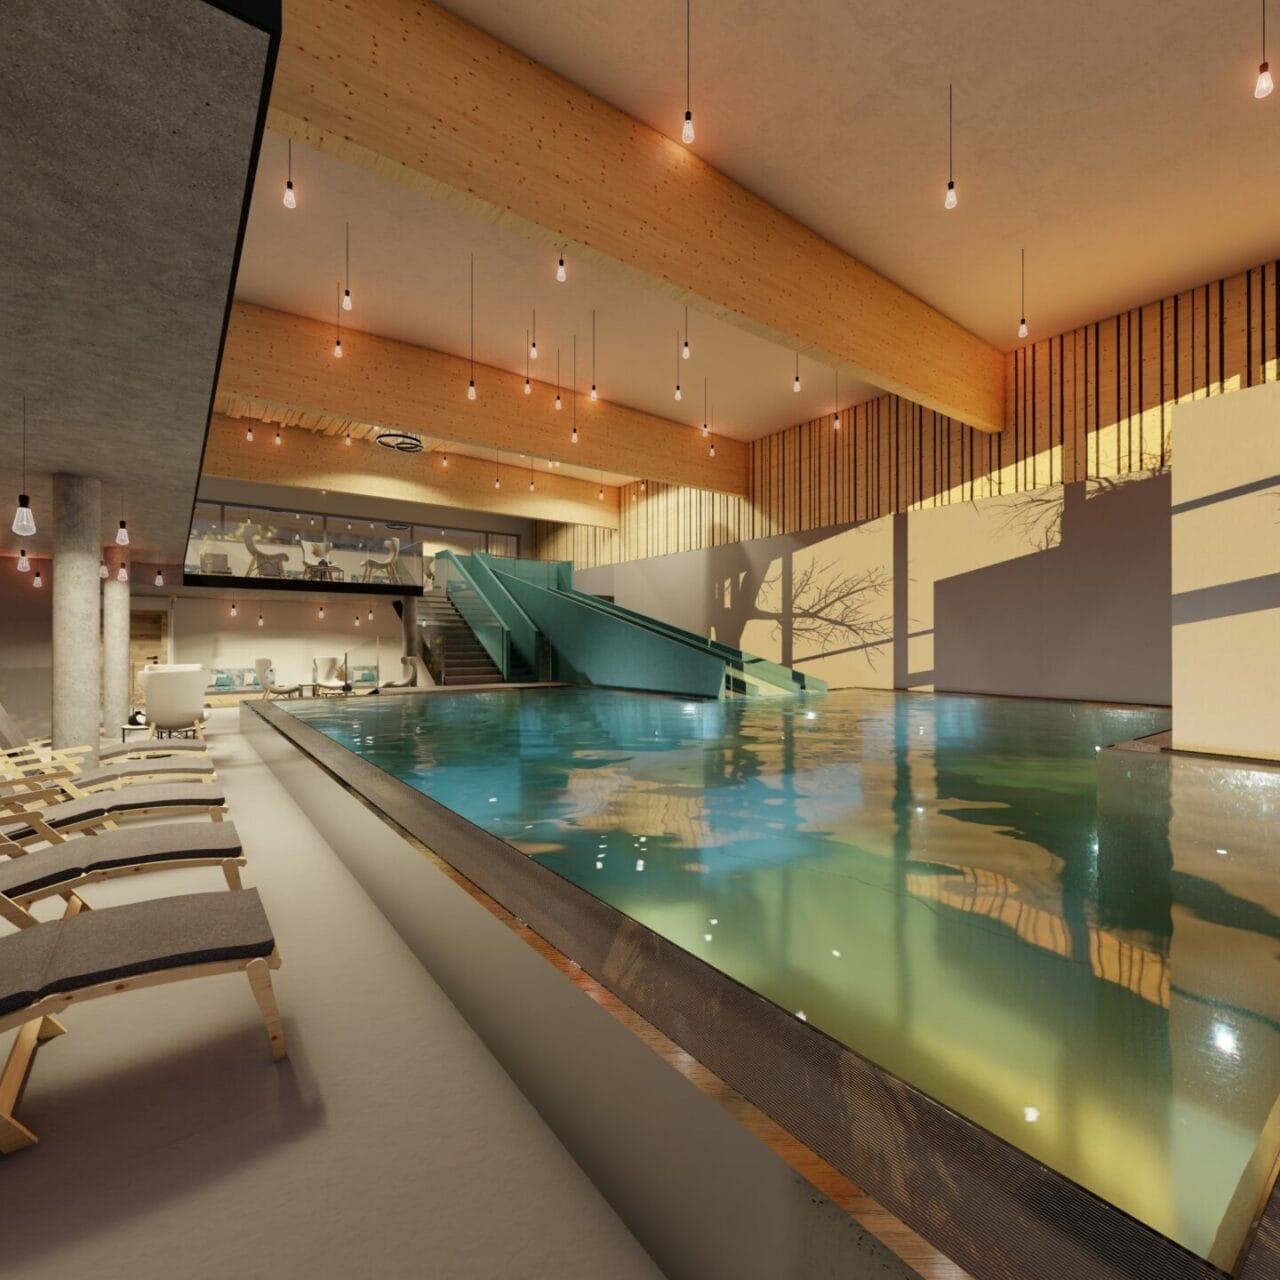 01.Hofgut-apartment-lifestyle-resort-wagrain-in-und-outdoorpools-hallenbad-1-scaled